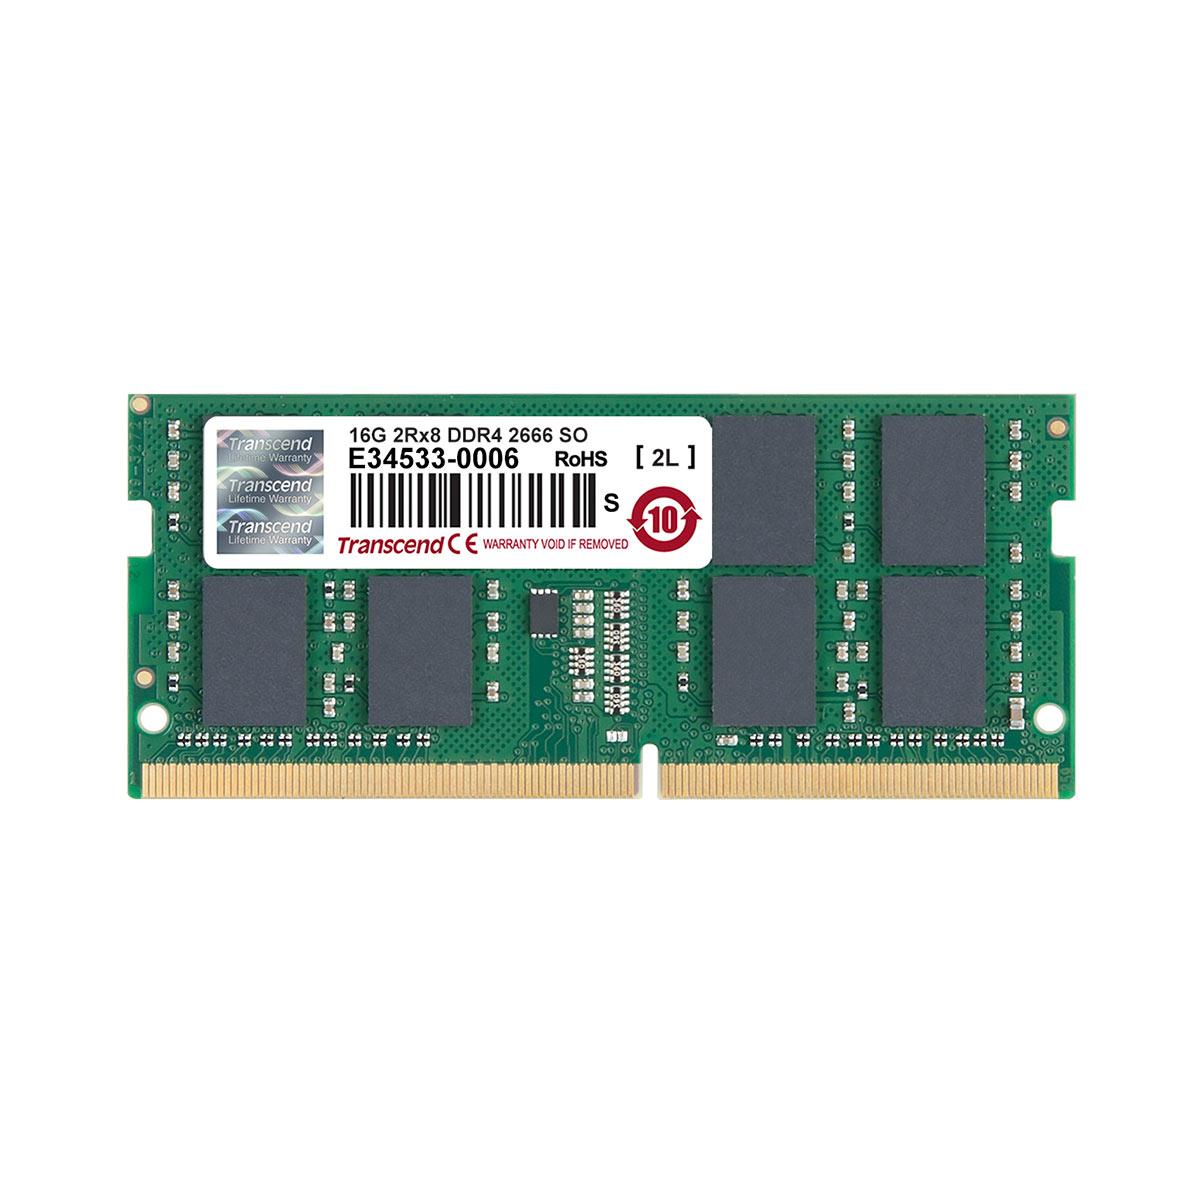 Transcend 増設メモリー 16GB ノートPC用 DDR4-2666 PC4-21300 SO-DIMM PCメモリ メモリーモジュール ノートパソコン用[TS2GSH64V6B]【ネコポス対応】【楽天BOX受取対象商品】【送料無料】